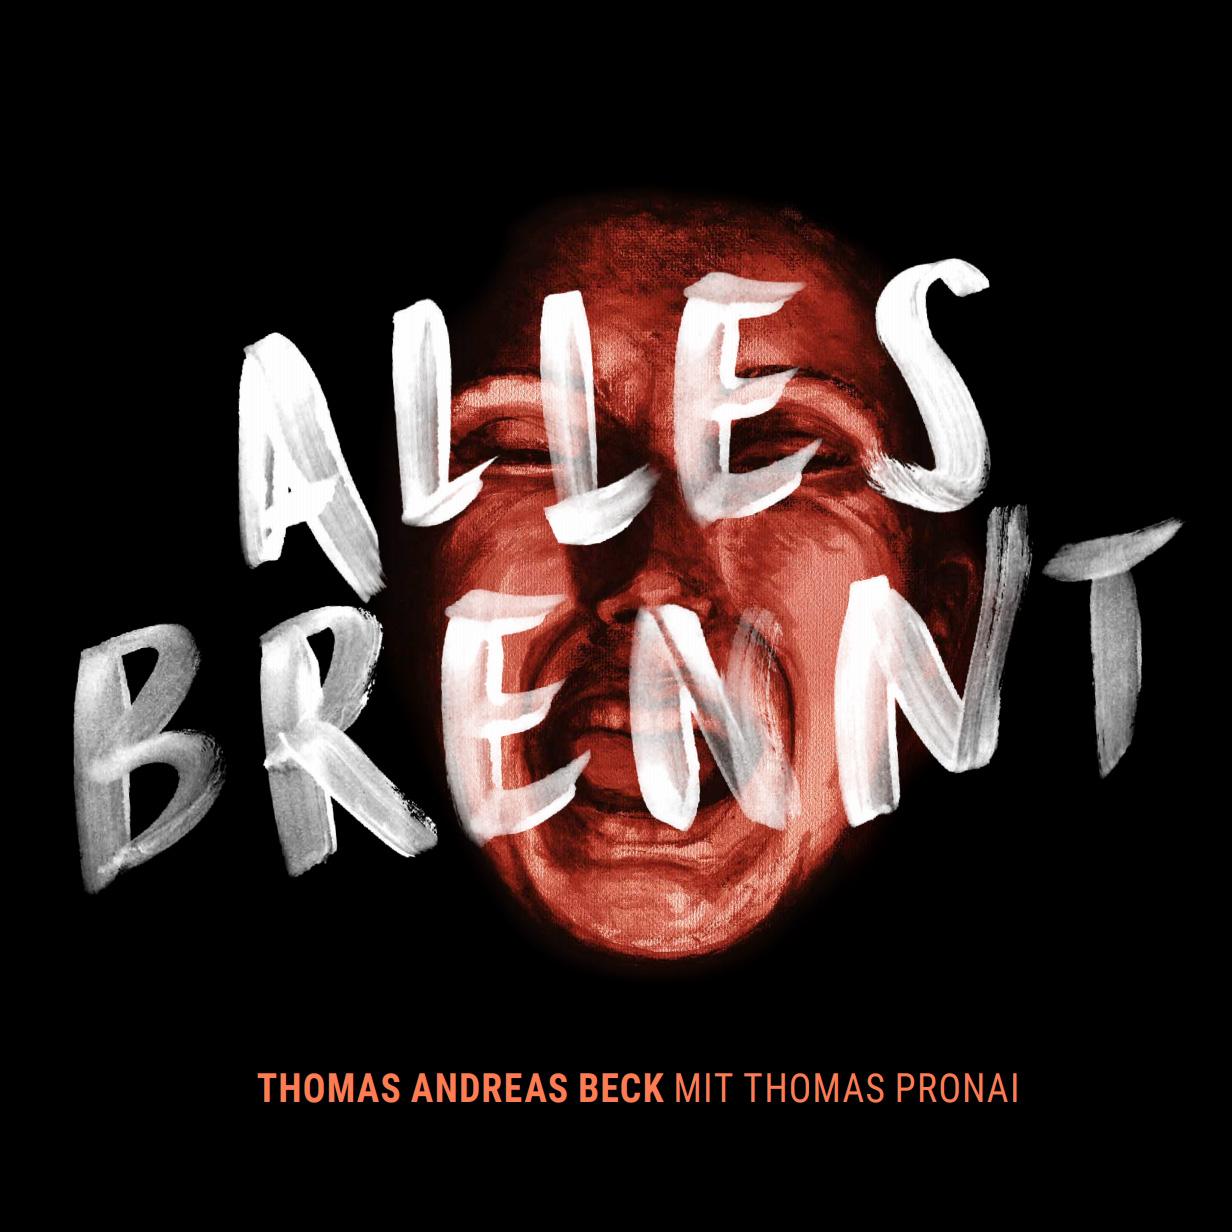 Thomas Andreas Beck - Alles brennt